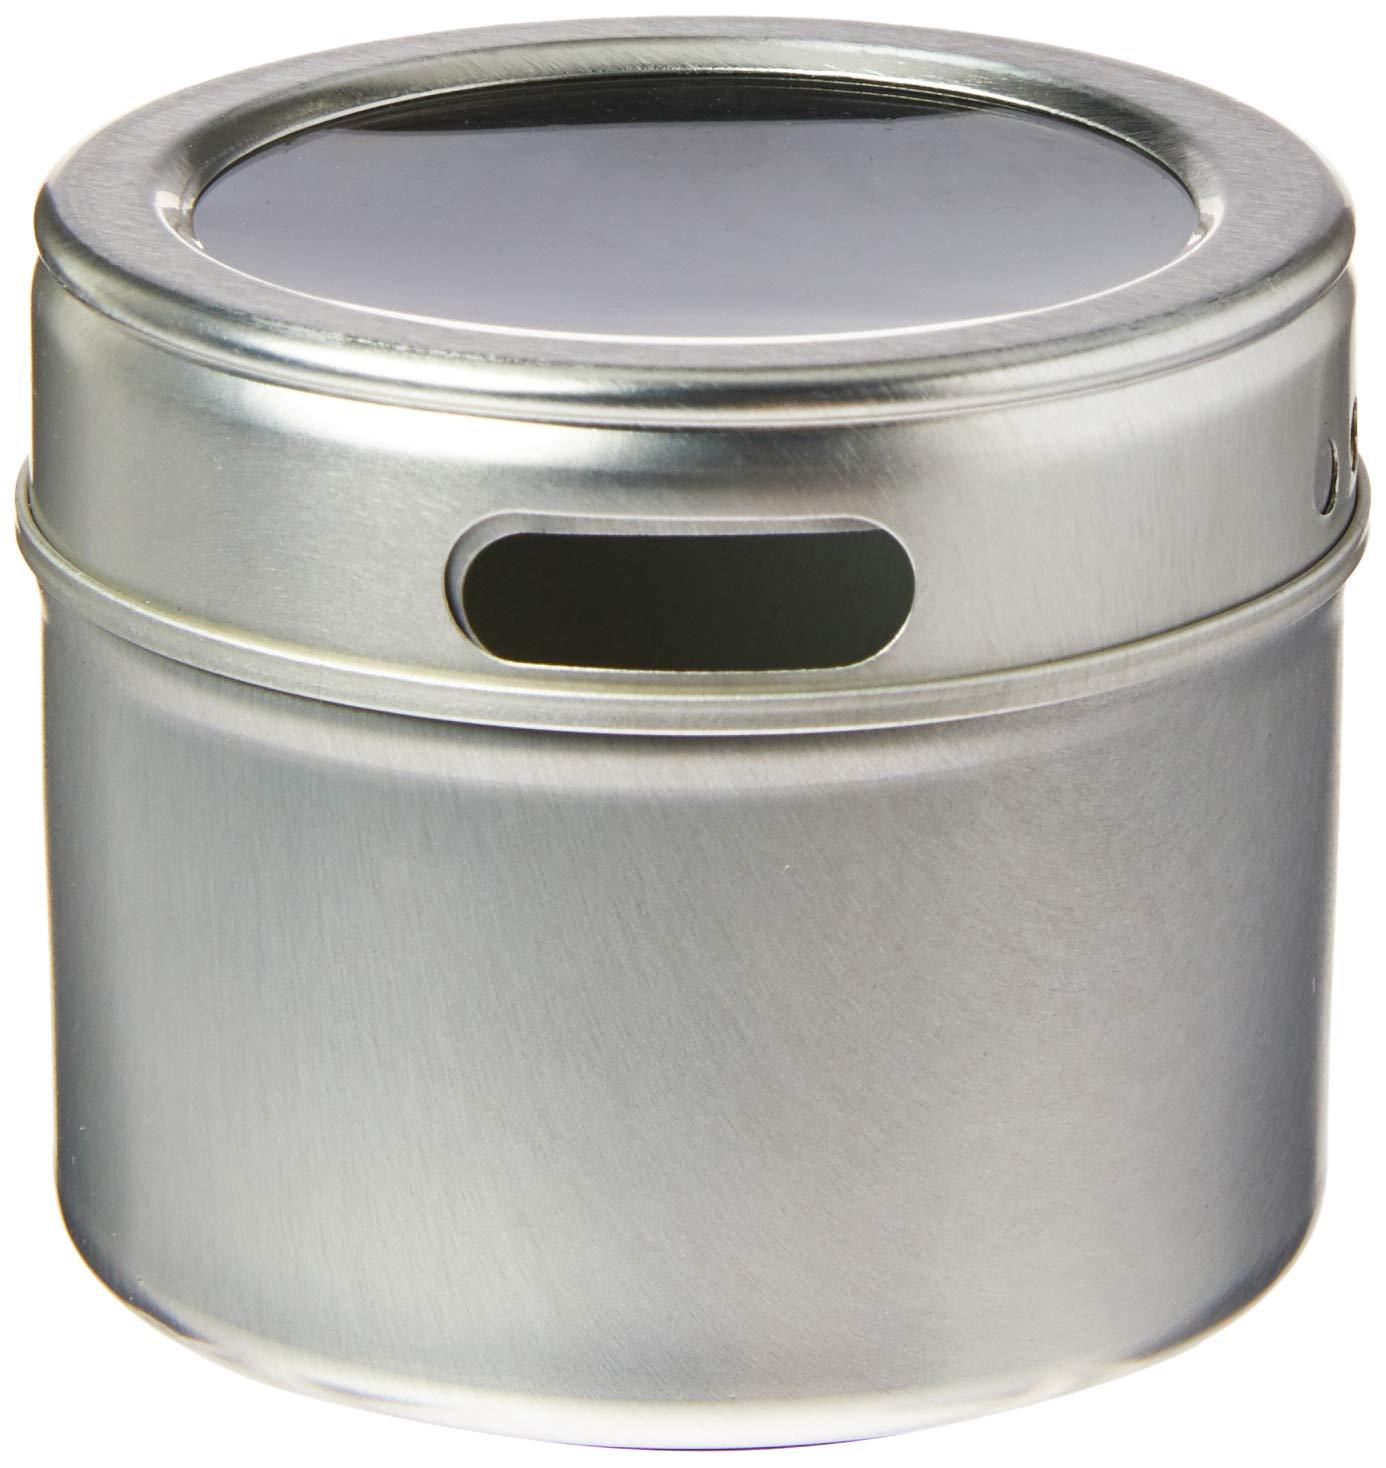 Fackelmann Cooking - Bote magnético, 6 x 5,5 cm, 1 unidad: Amazon ...